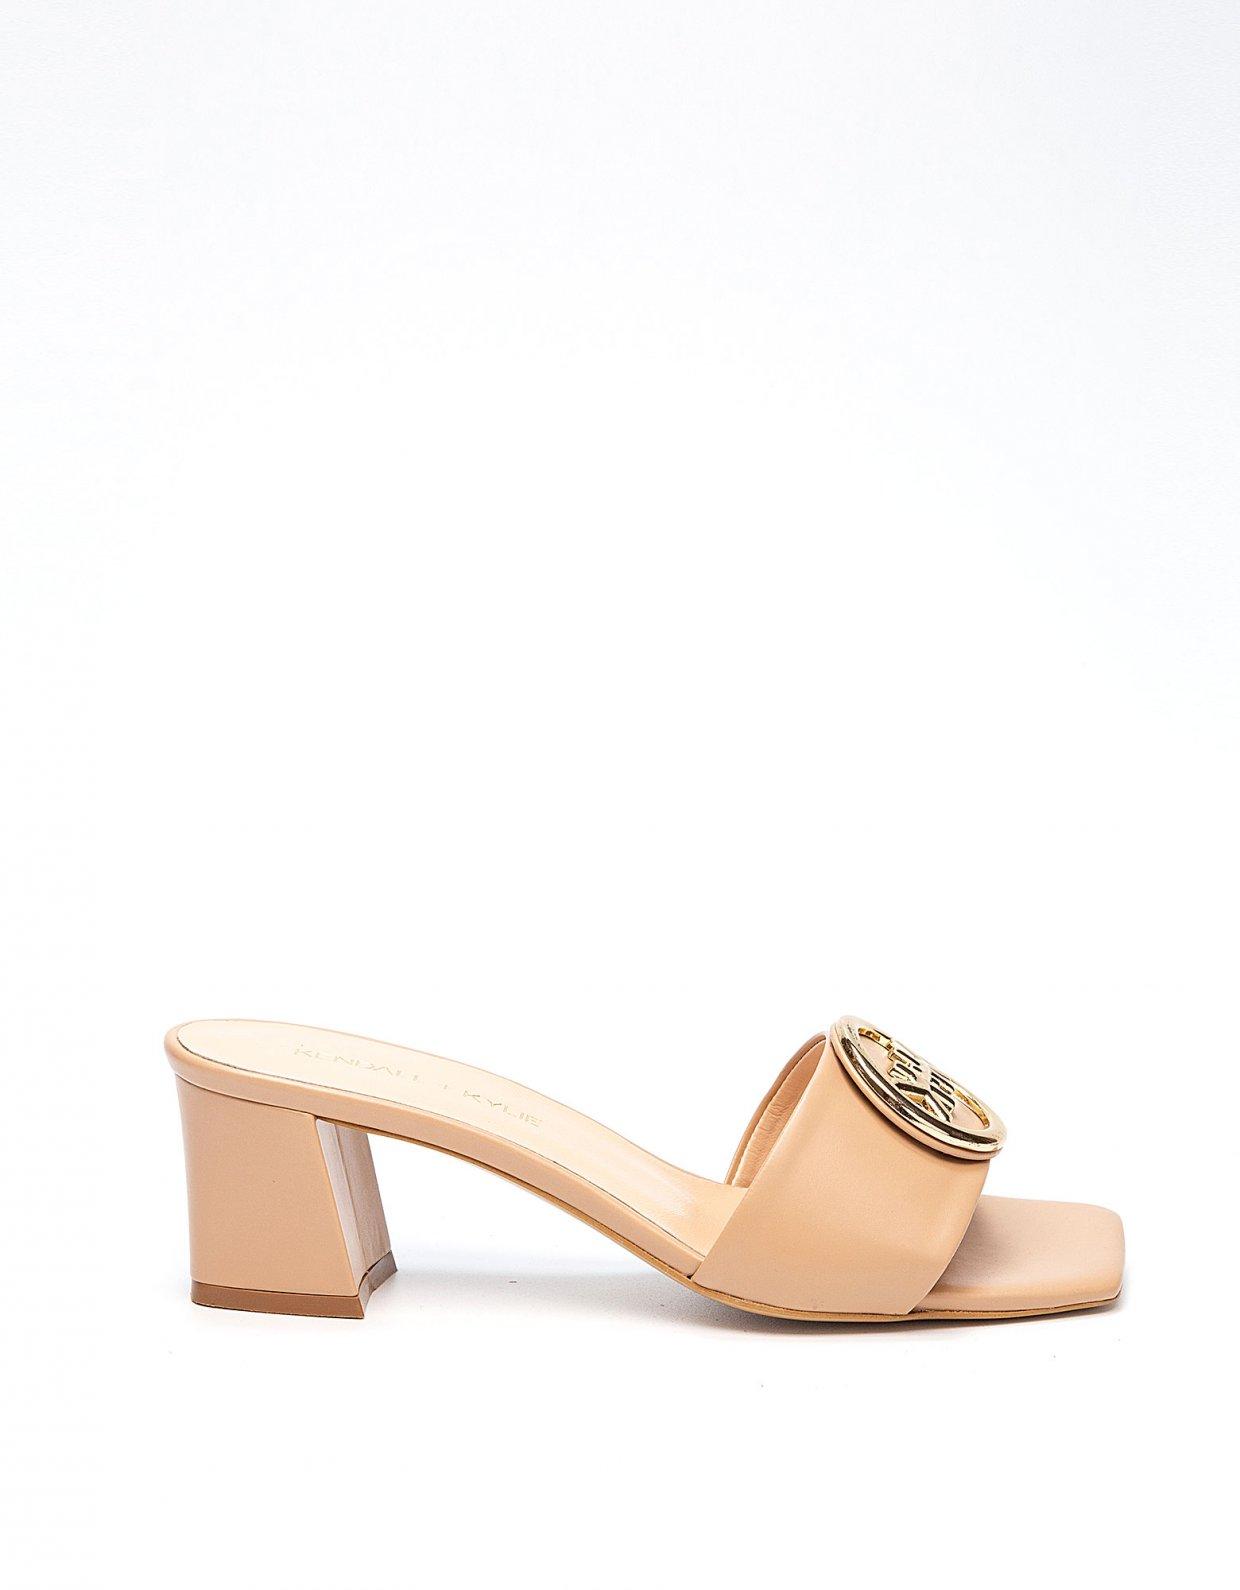 Kendall + Kylie Baya nude sandals